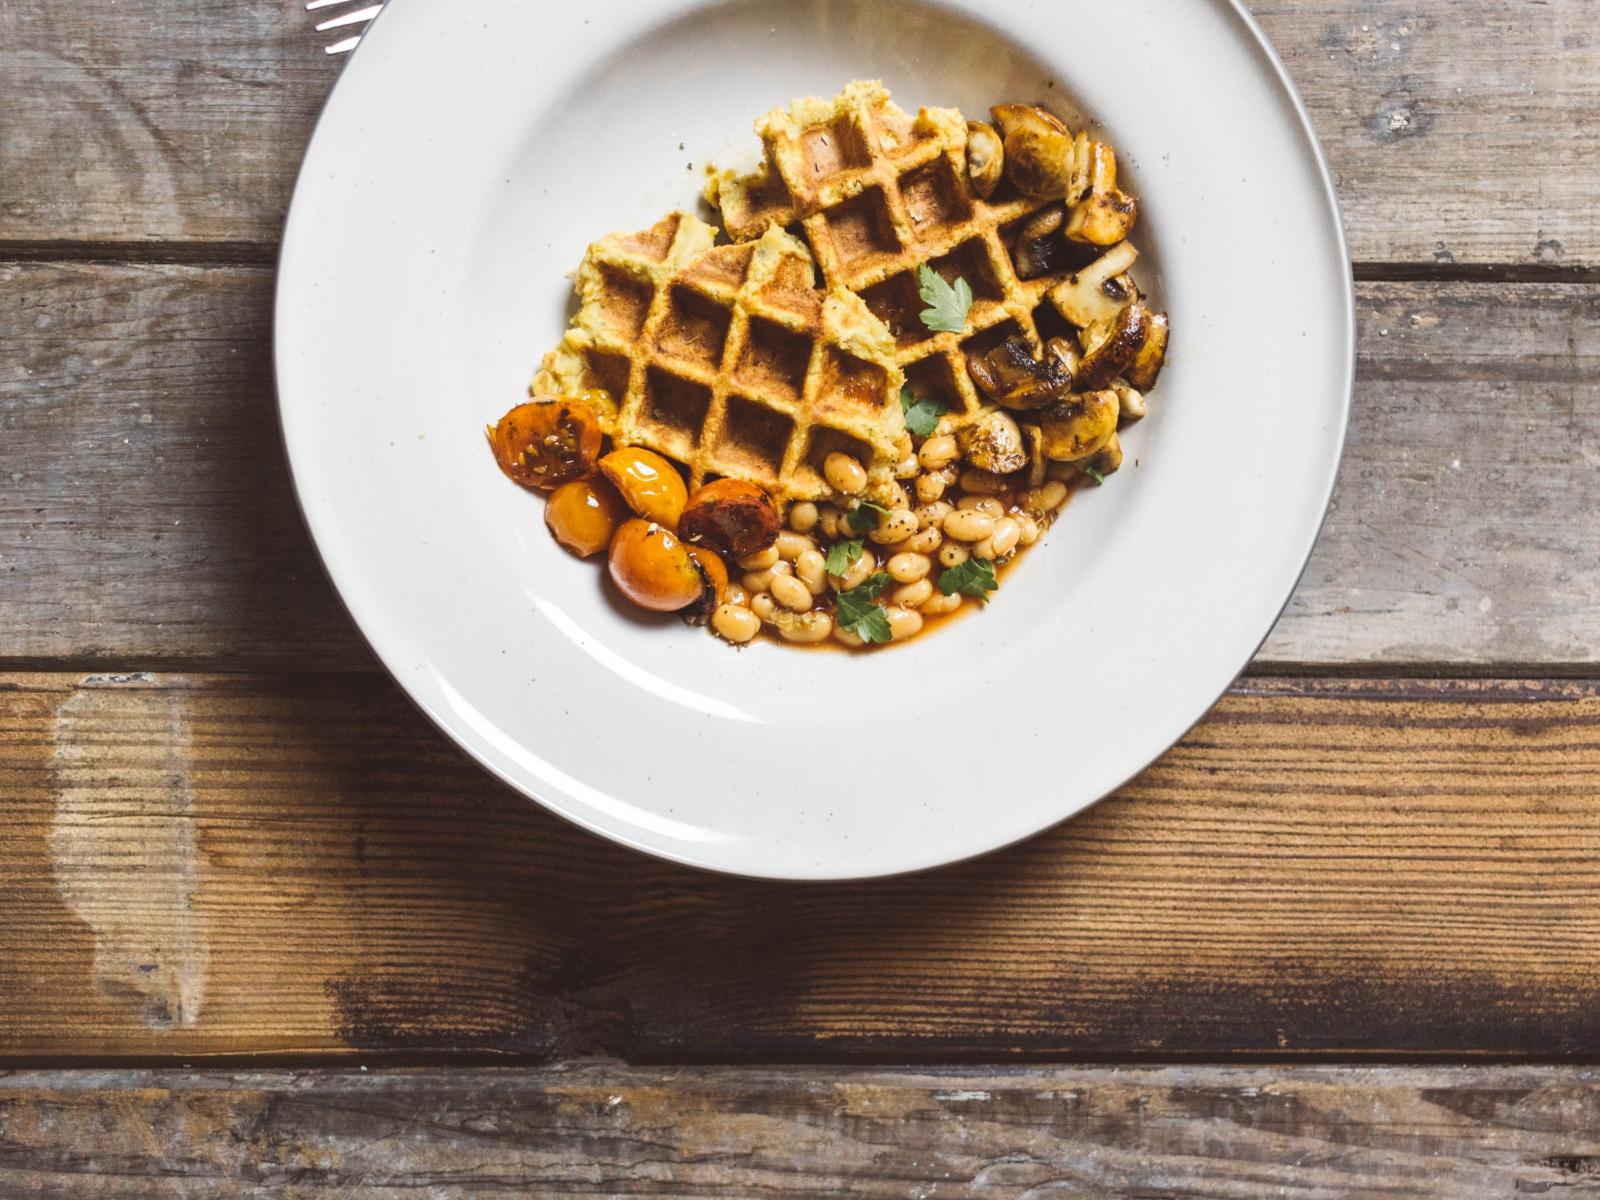 Vegan sweet potato waffles